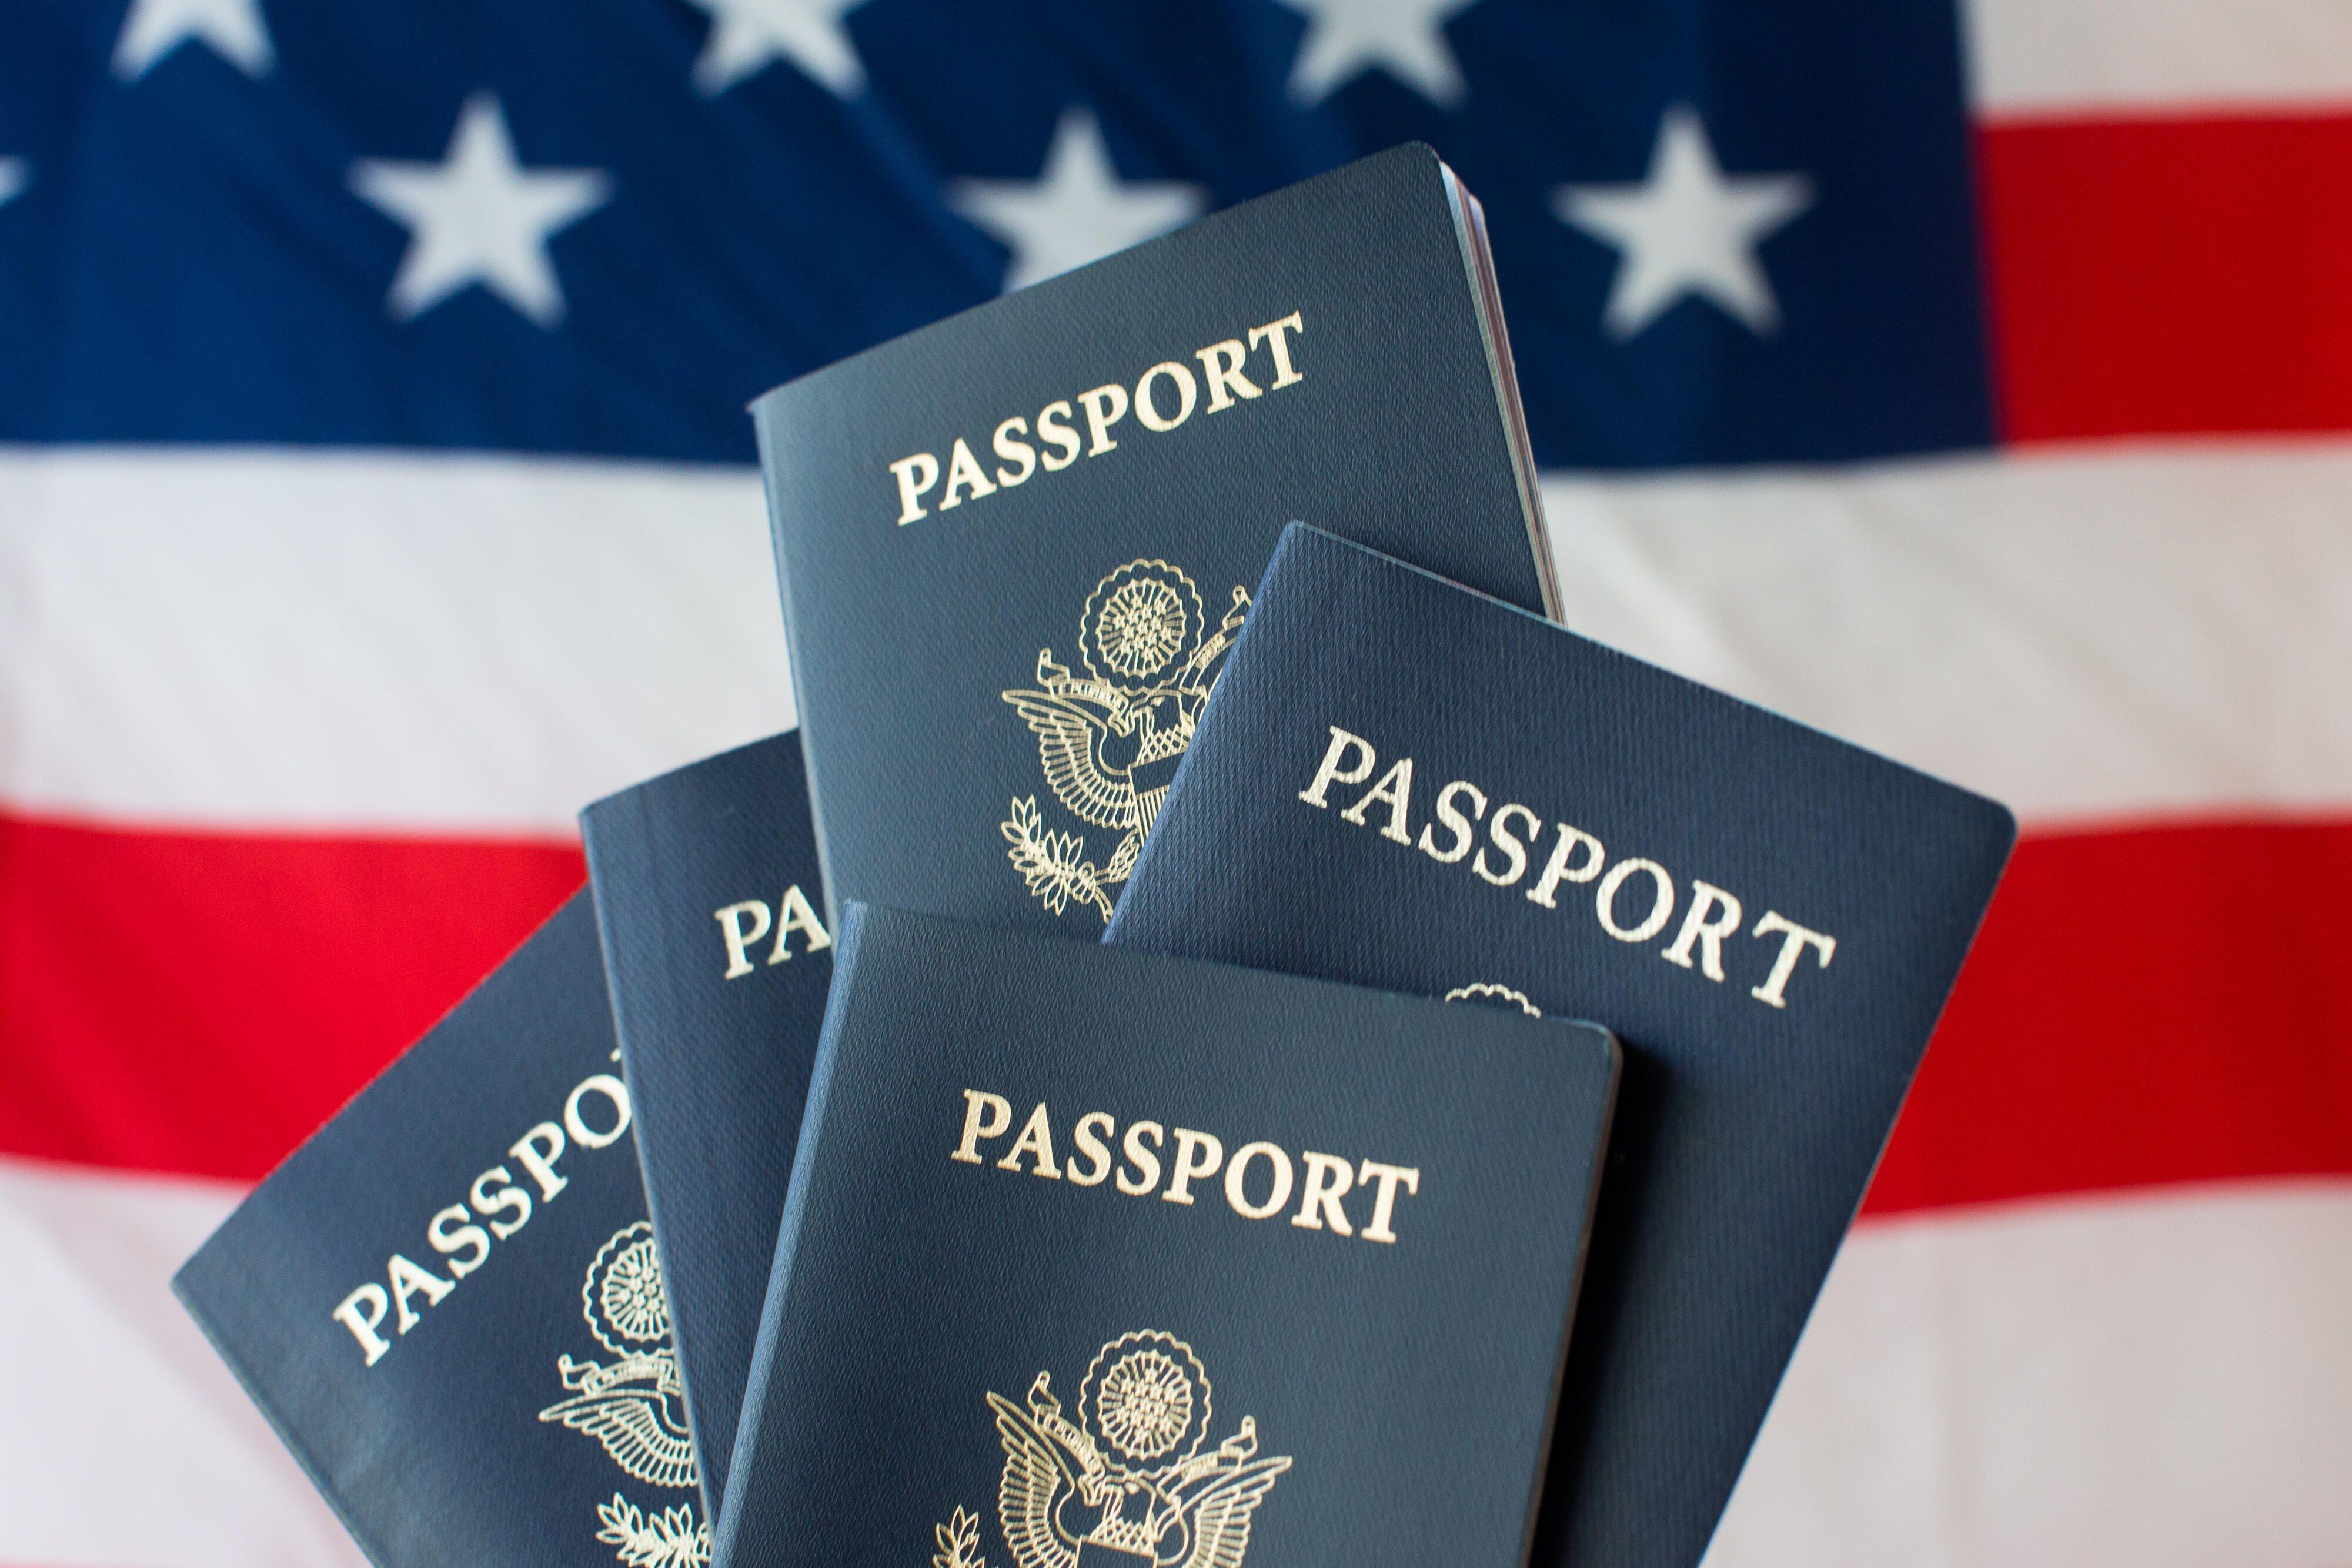 passport-american-flag-3714